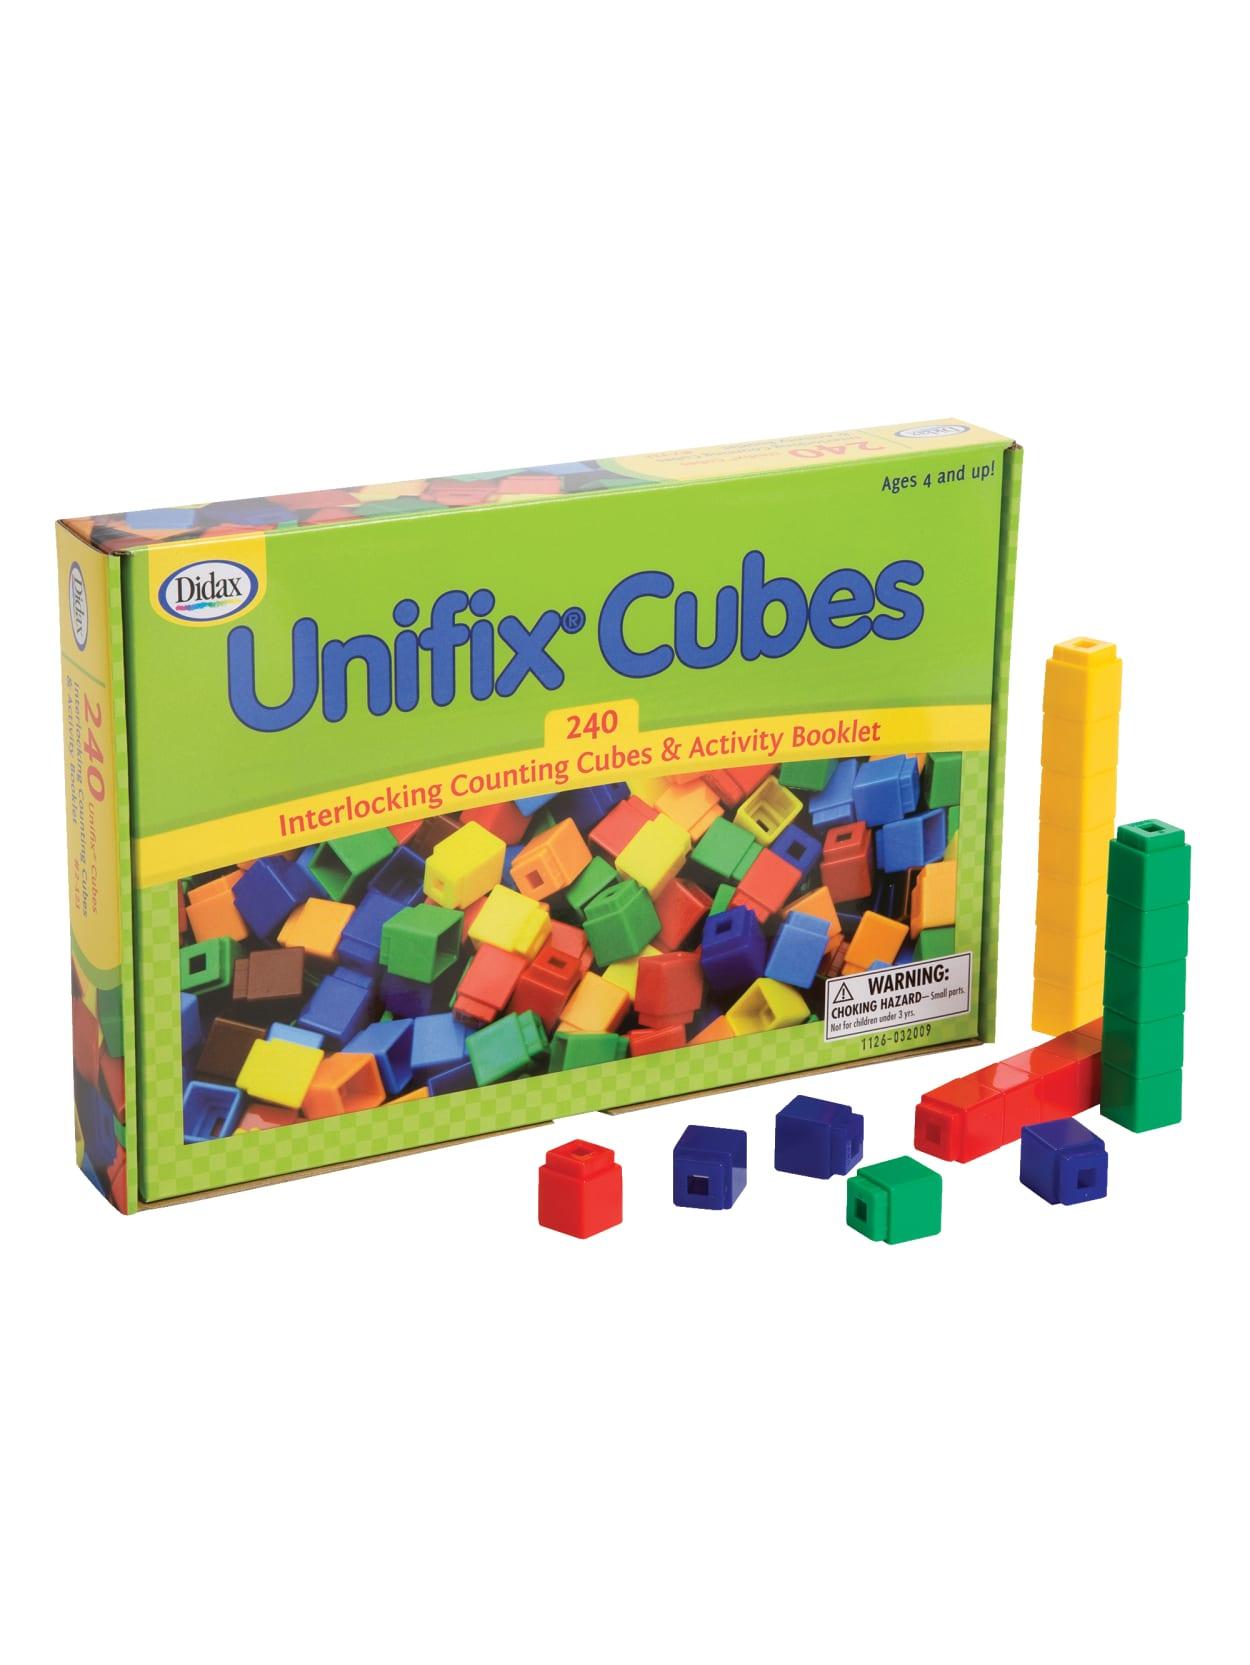 Didax Unifix Cubes